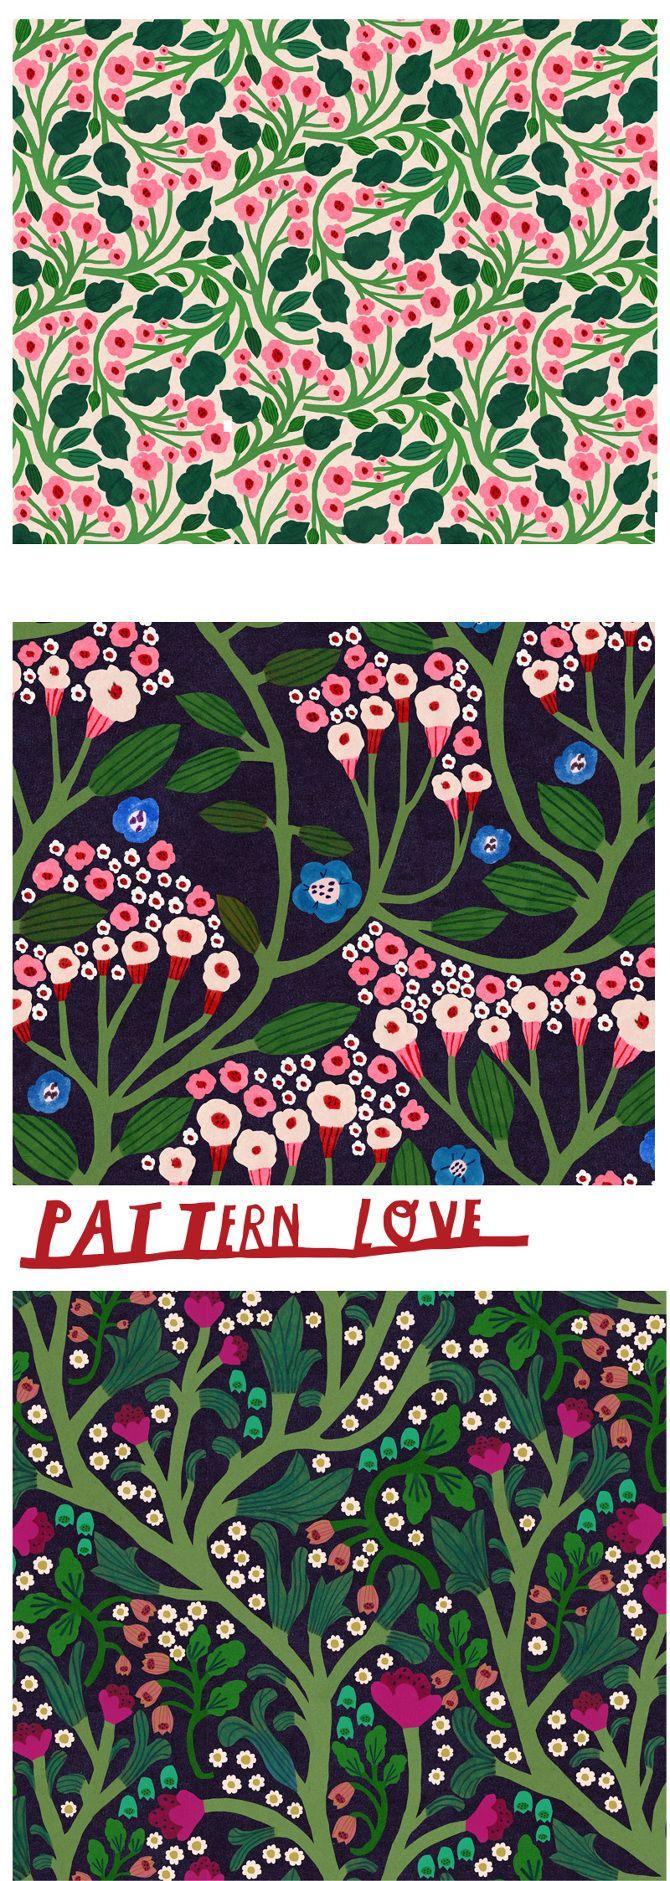 patterns - walkyland